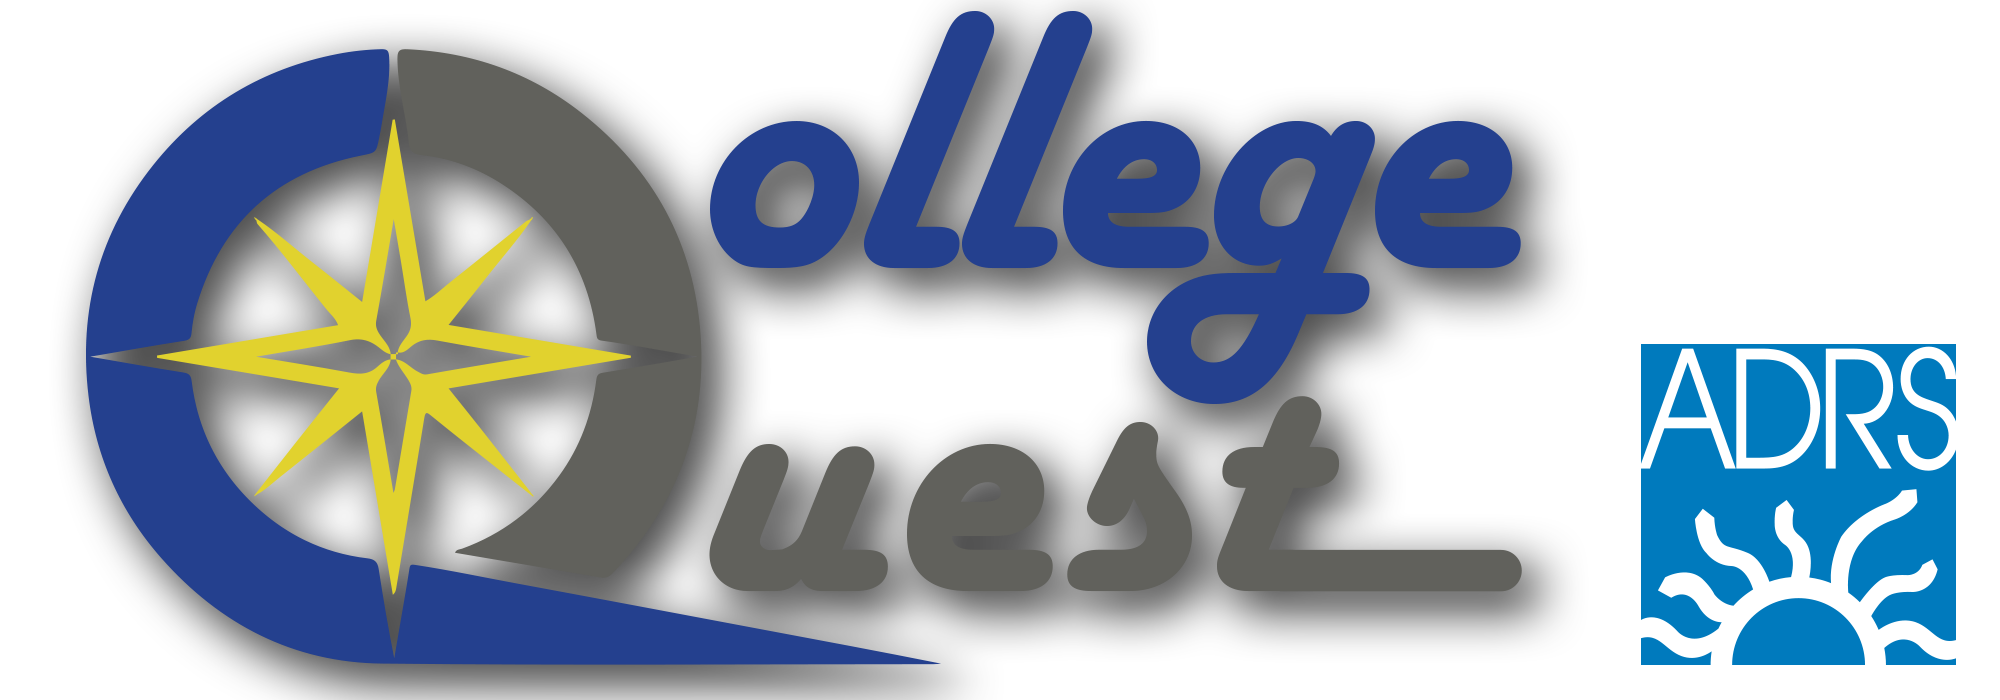 Attractive College Quest Logo